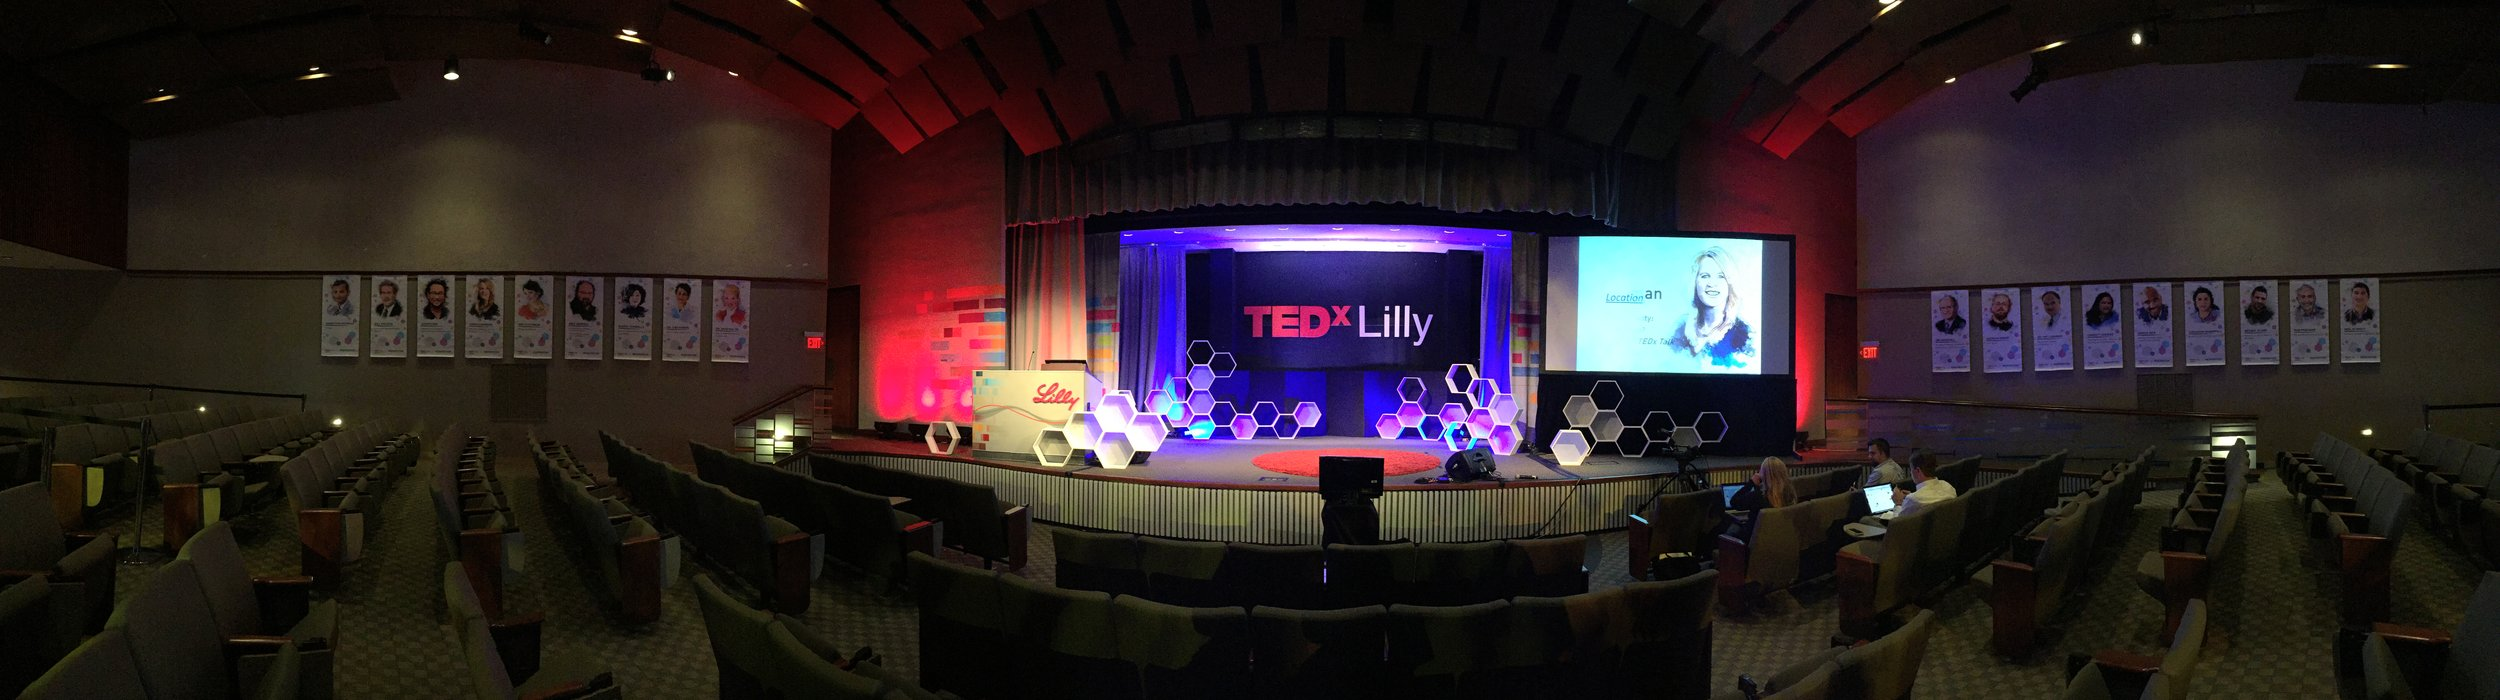 TEDxLilly2015-02.JPG